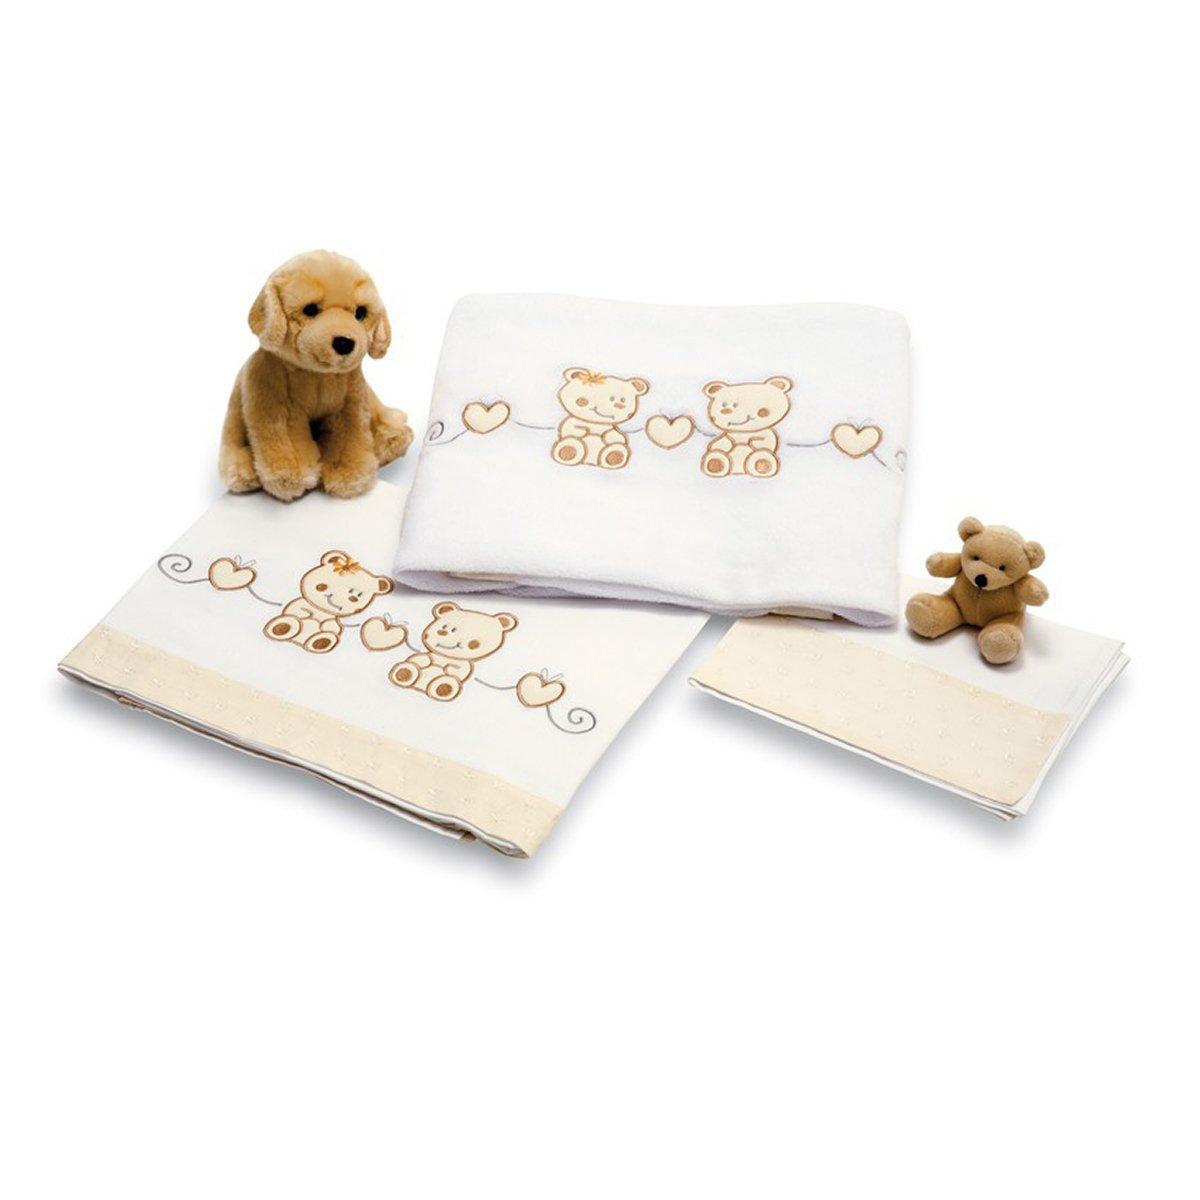 lenjerie de pat copii pali 3 piese tip tap, beige